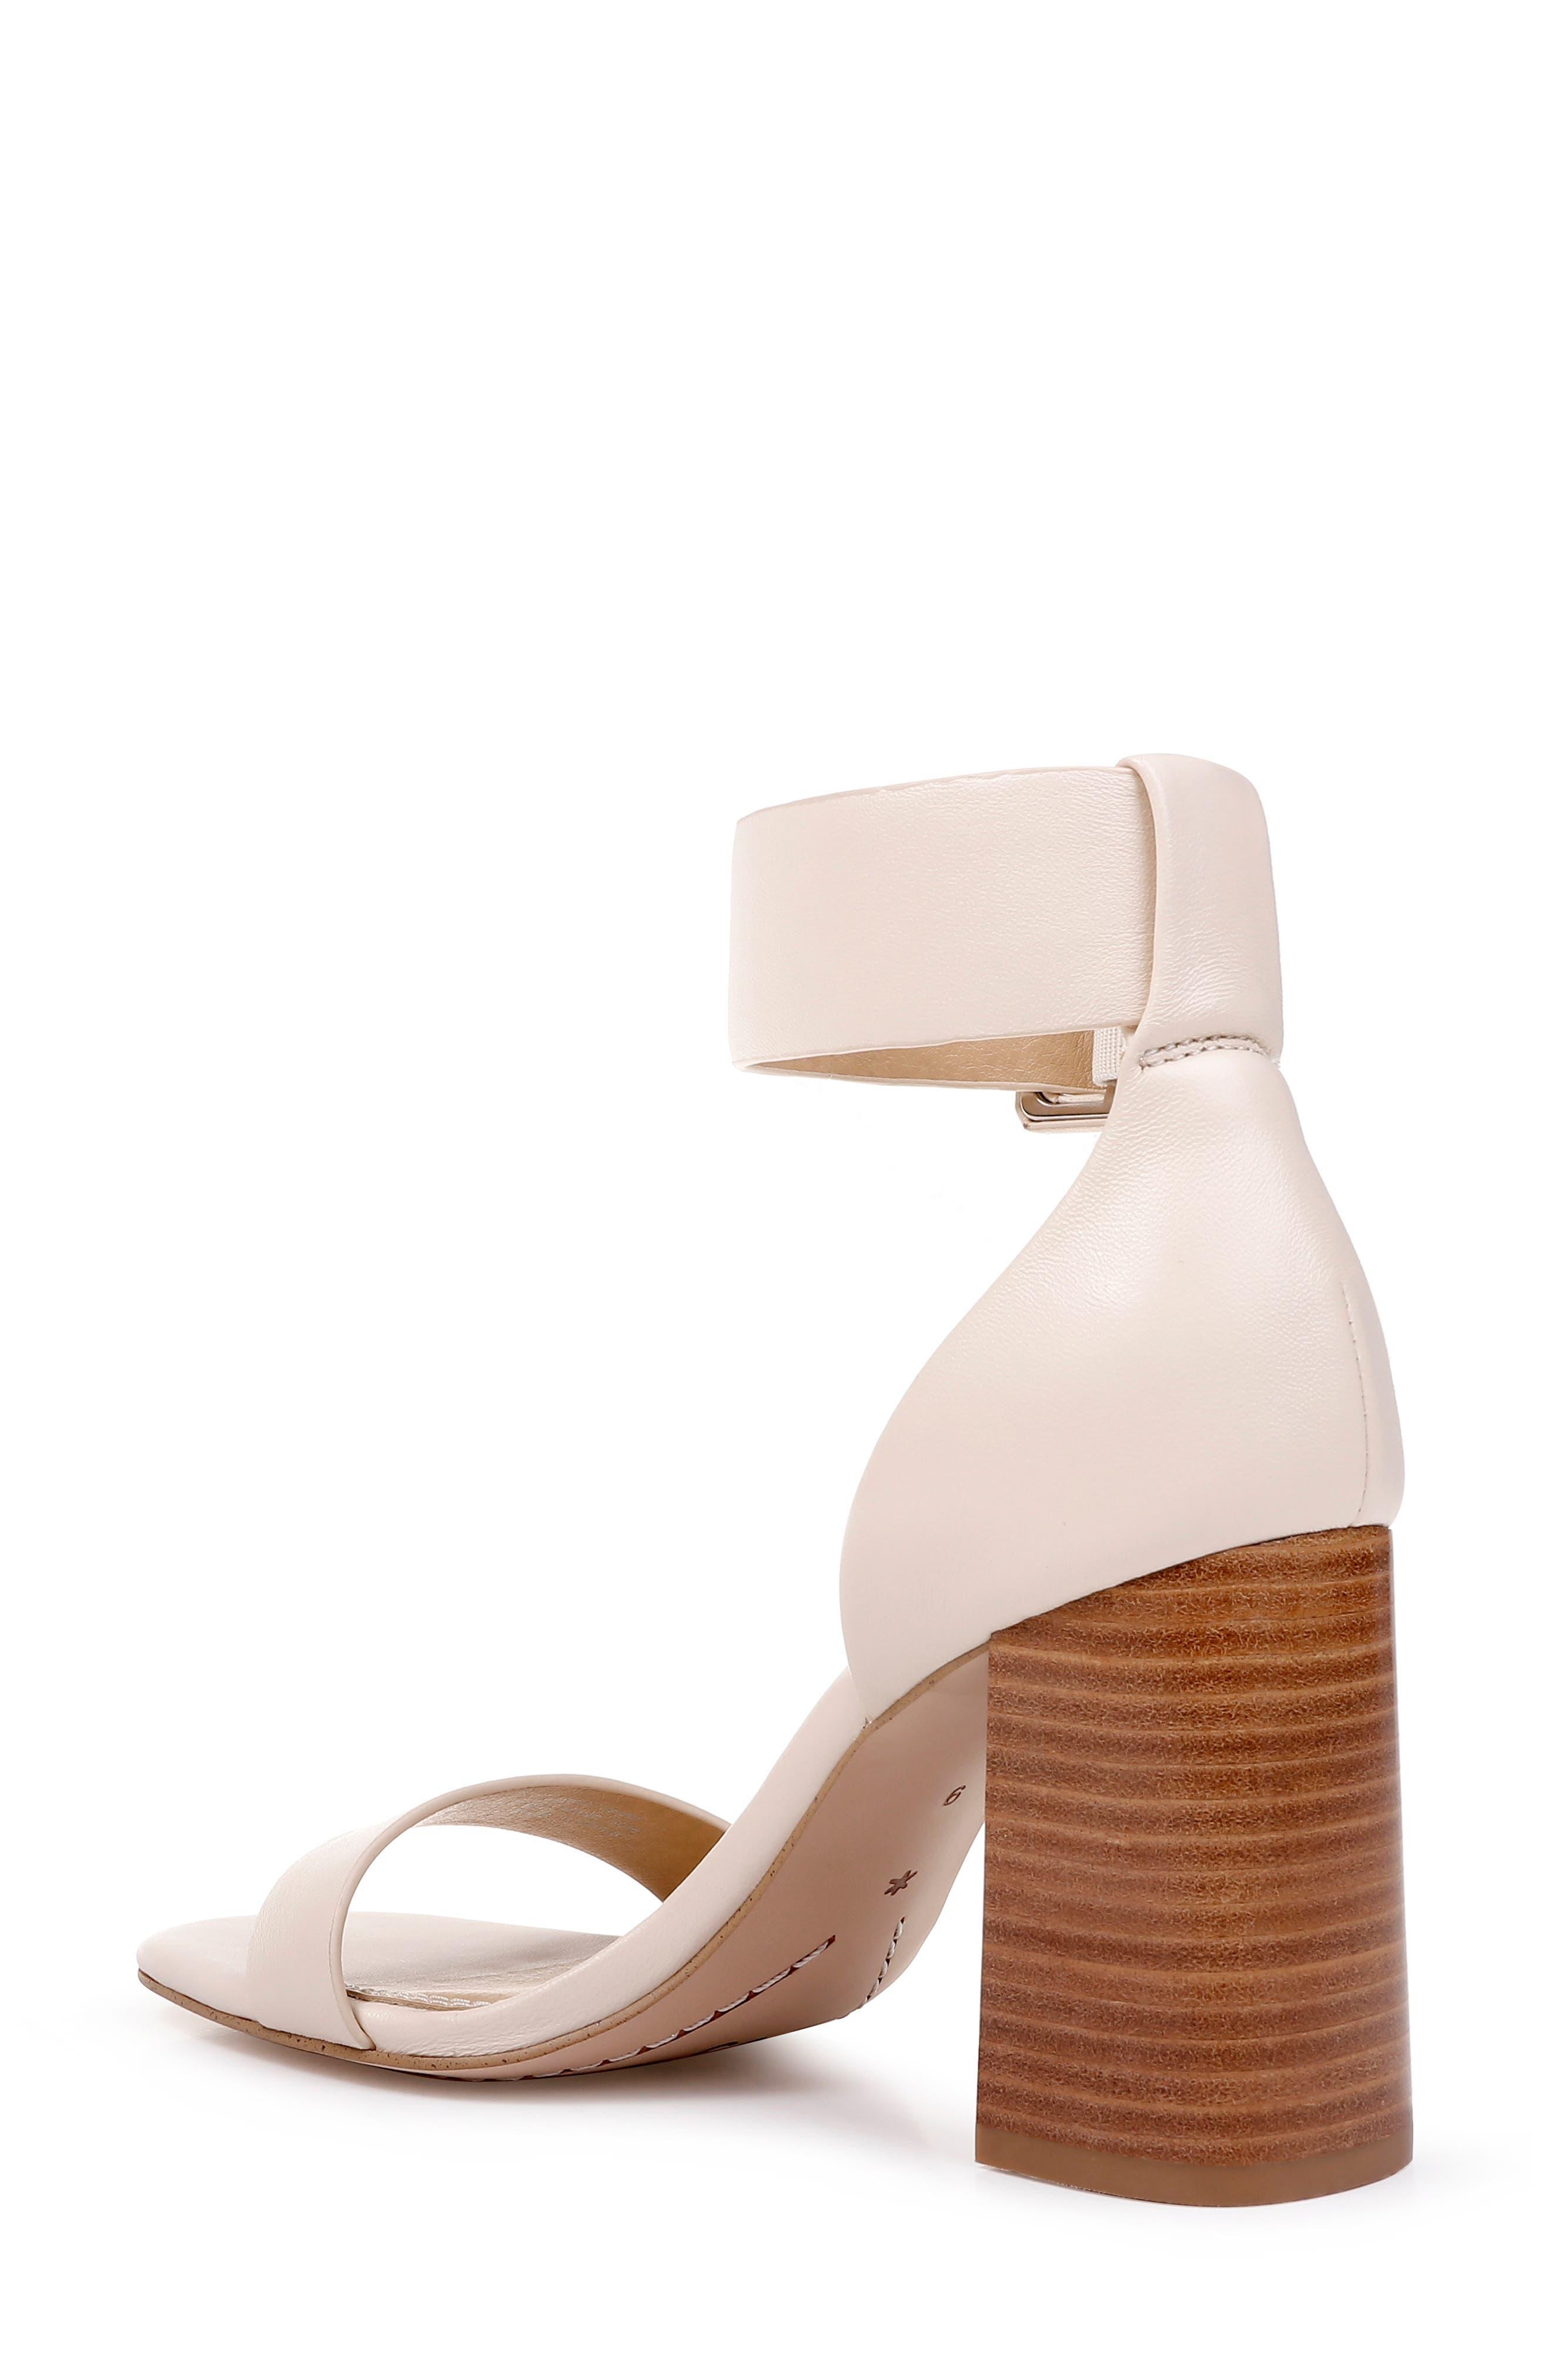 Block Heel Sandal,                             Alternate thumbnail 2, color,                             CREAM LEATHER